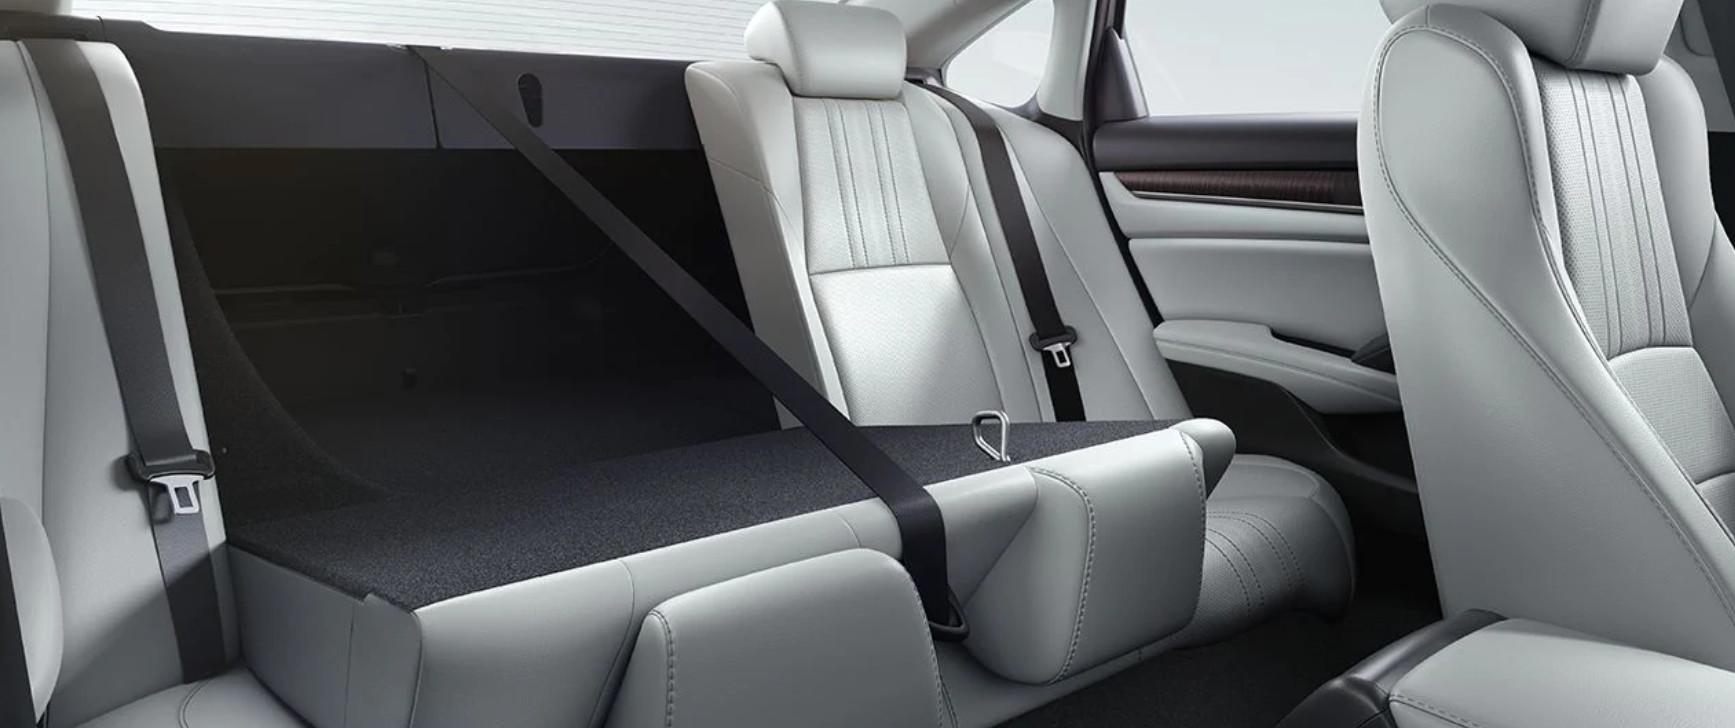 Versatile Seating Options in the 2020 Honda Accord